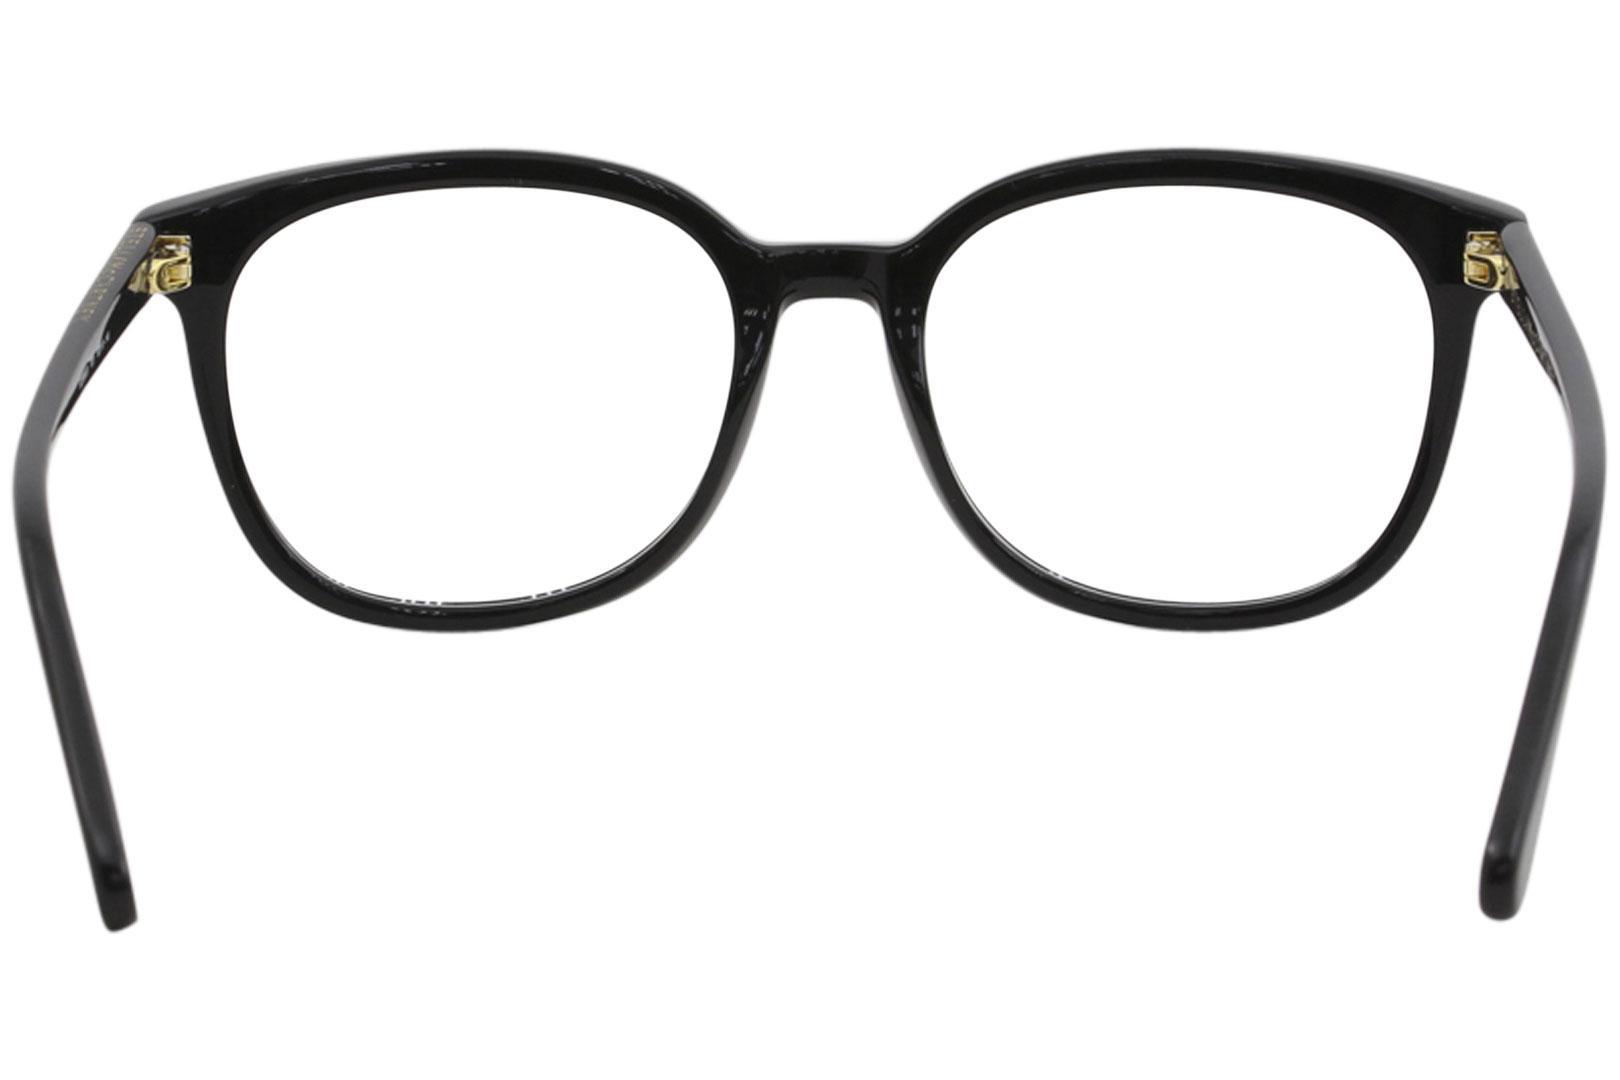 17e2479b91 Stella McCartney Women s Eyeglasses SC0080OI SC 0080 OI Full Rim Optical  Frame by Stella McCartney. 12345